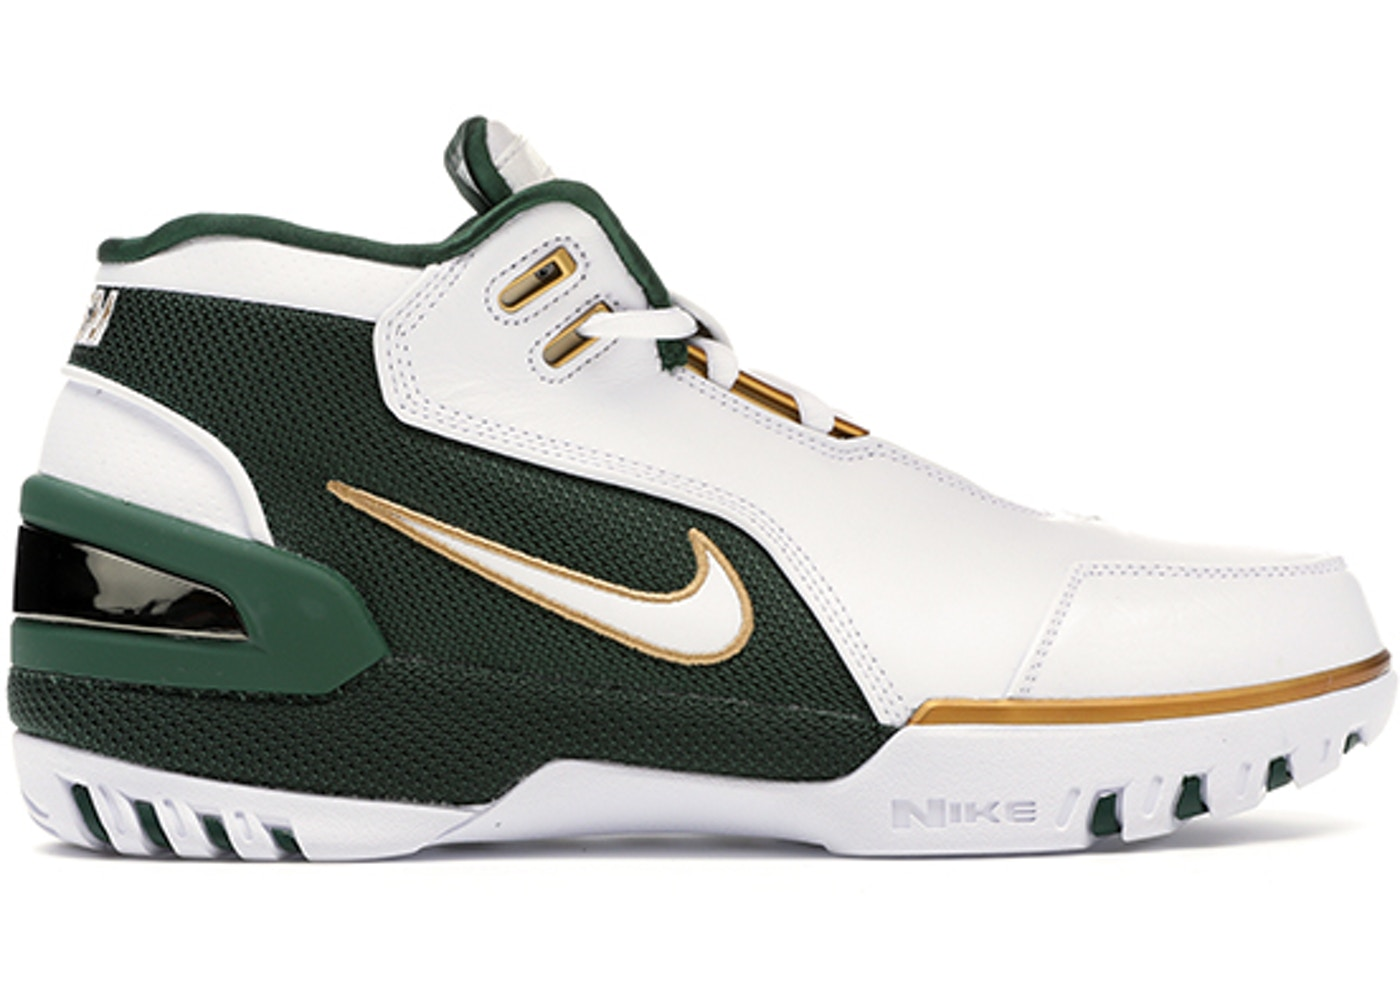 fdee3b83ed2c86 Buy Nike LeBron Shoes   Deadstock Sneakers